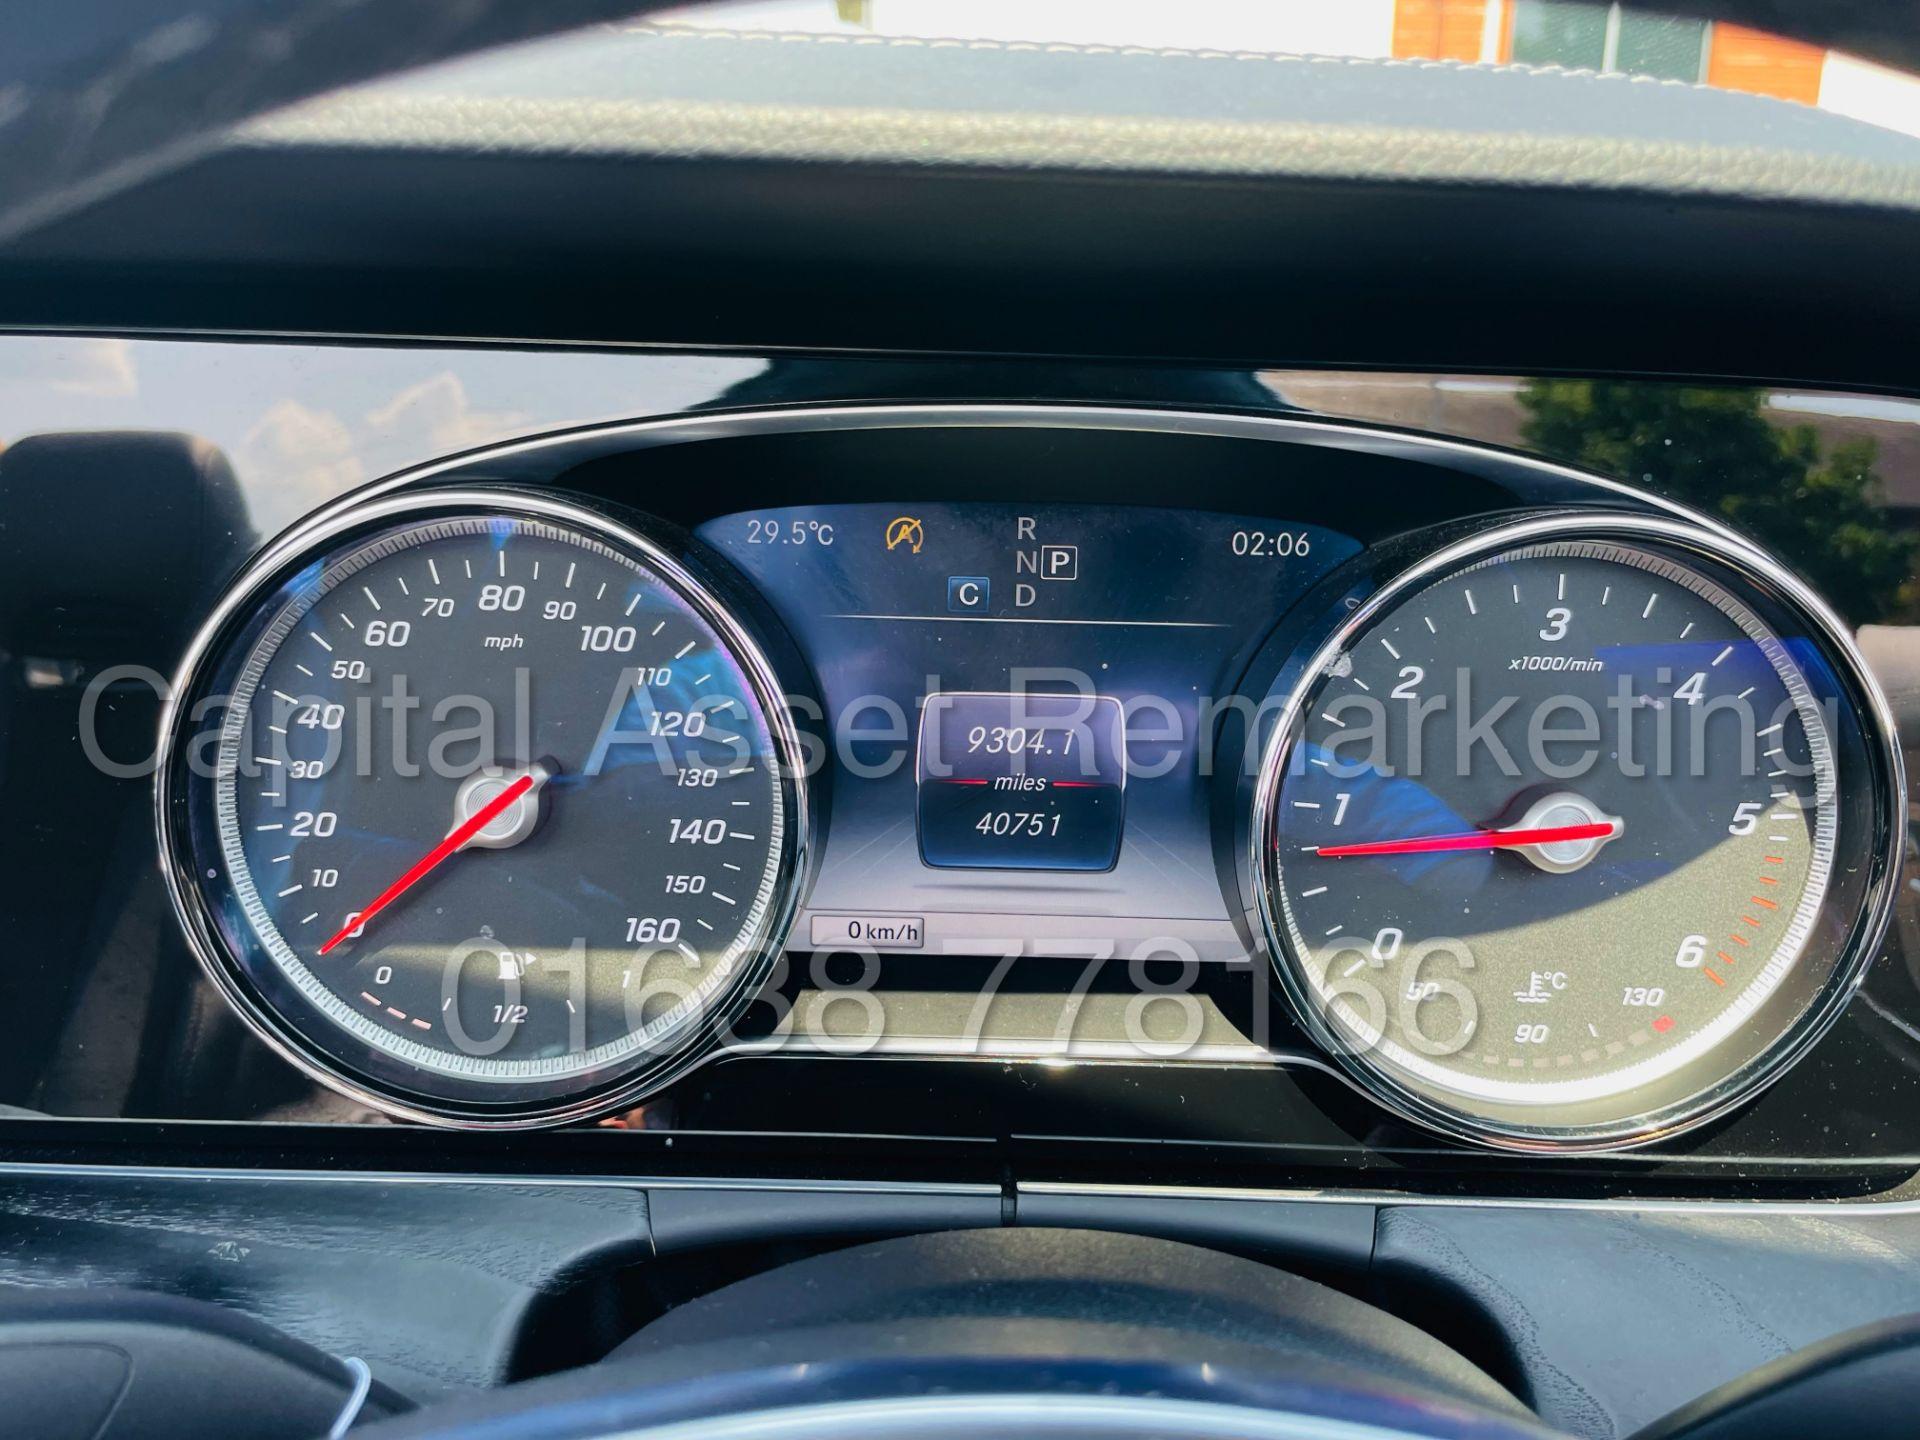 MERCEDES-BENZ E220d *AMG LINE PREMIUM - CABRIOLET* (2018 - EURO 6) '9G AUTO - LEATHER - SAT NAV' - Image 63 of 63